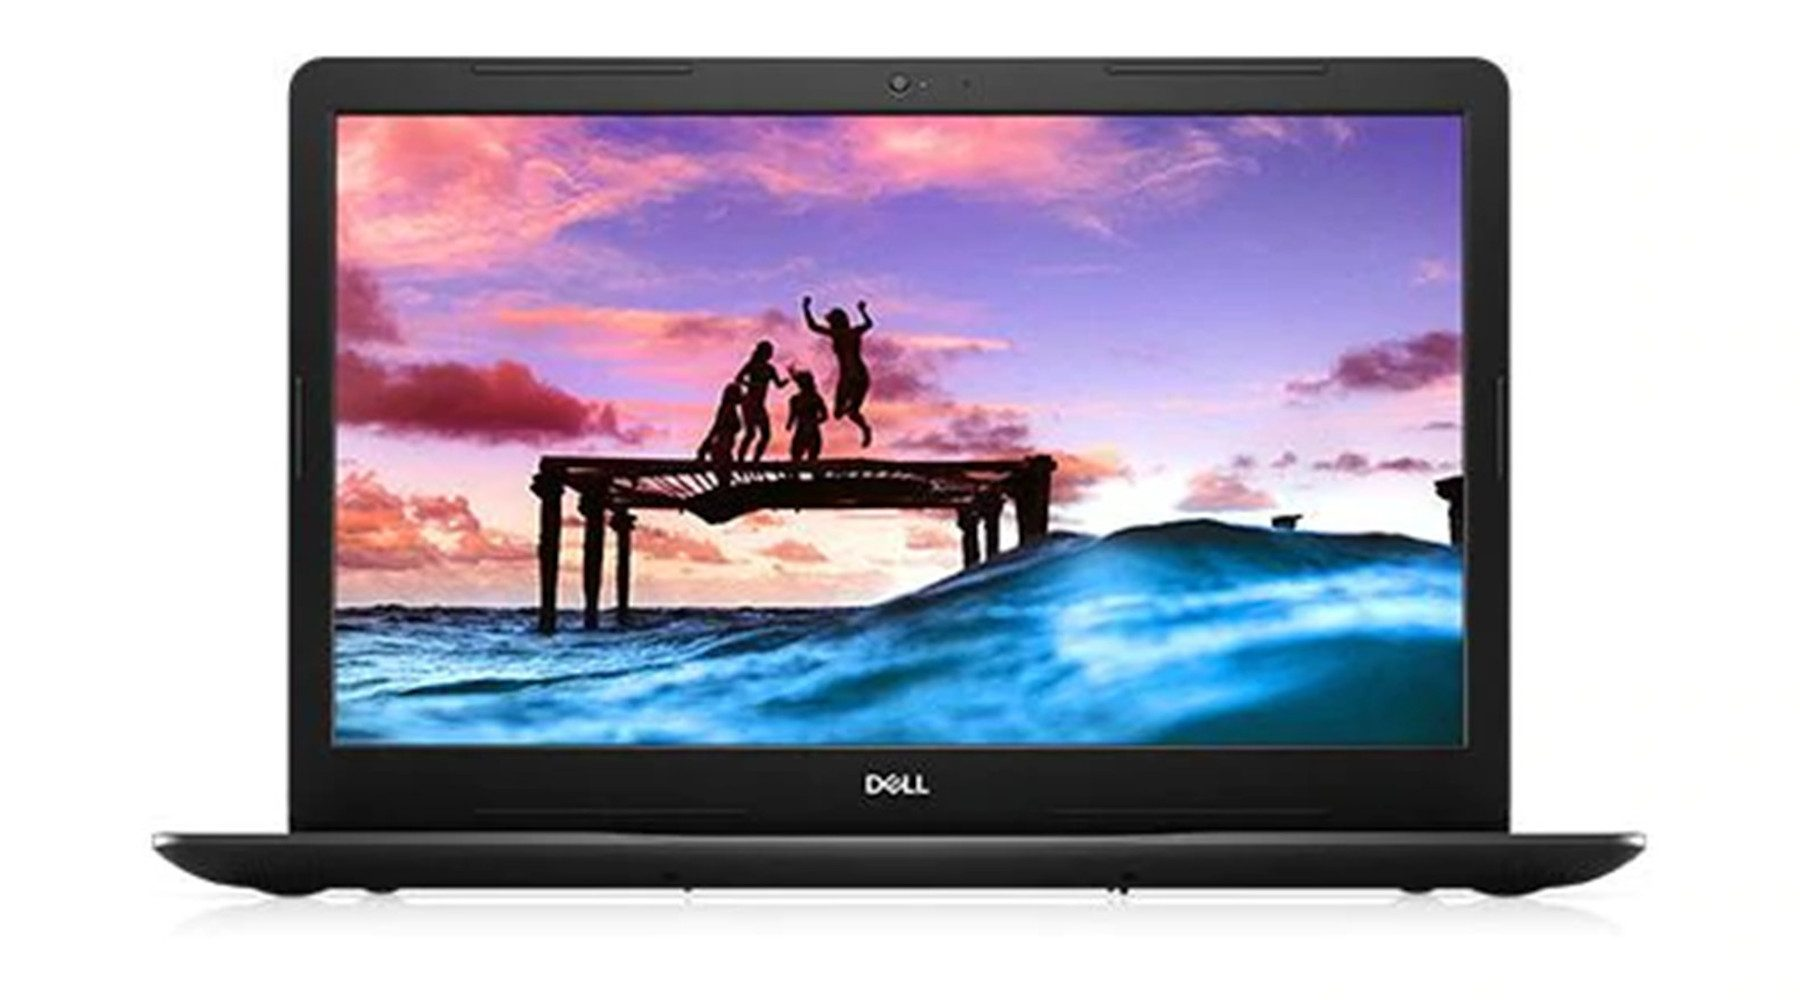 </p><h4>30% off Dell Inspiron 15 3000 - save $210</h4><p>